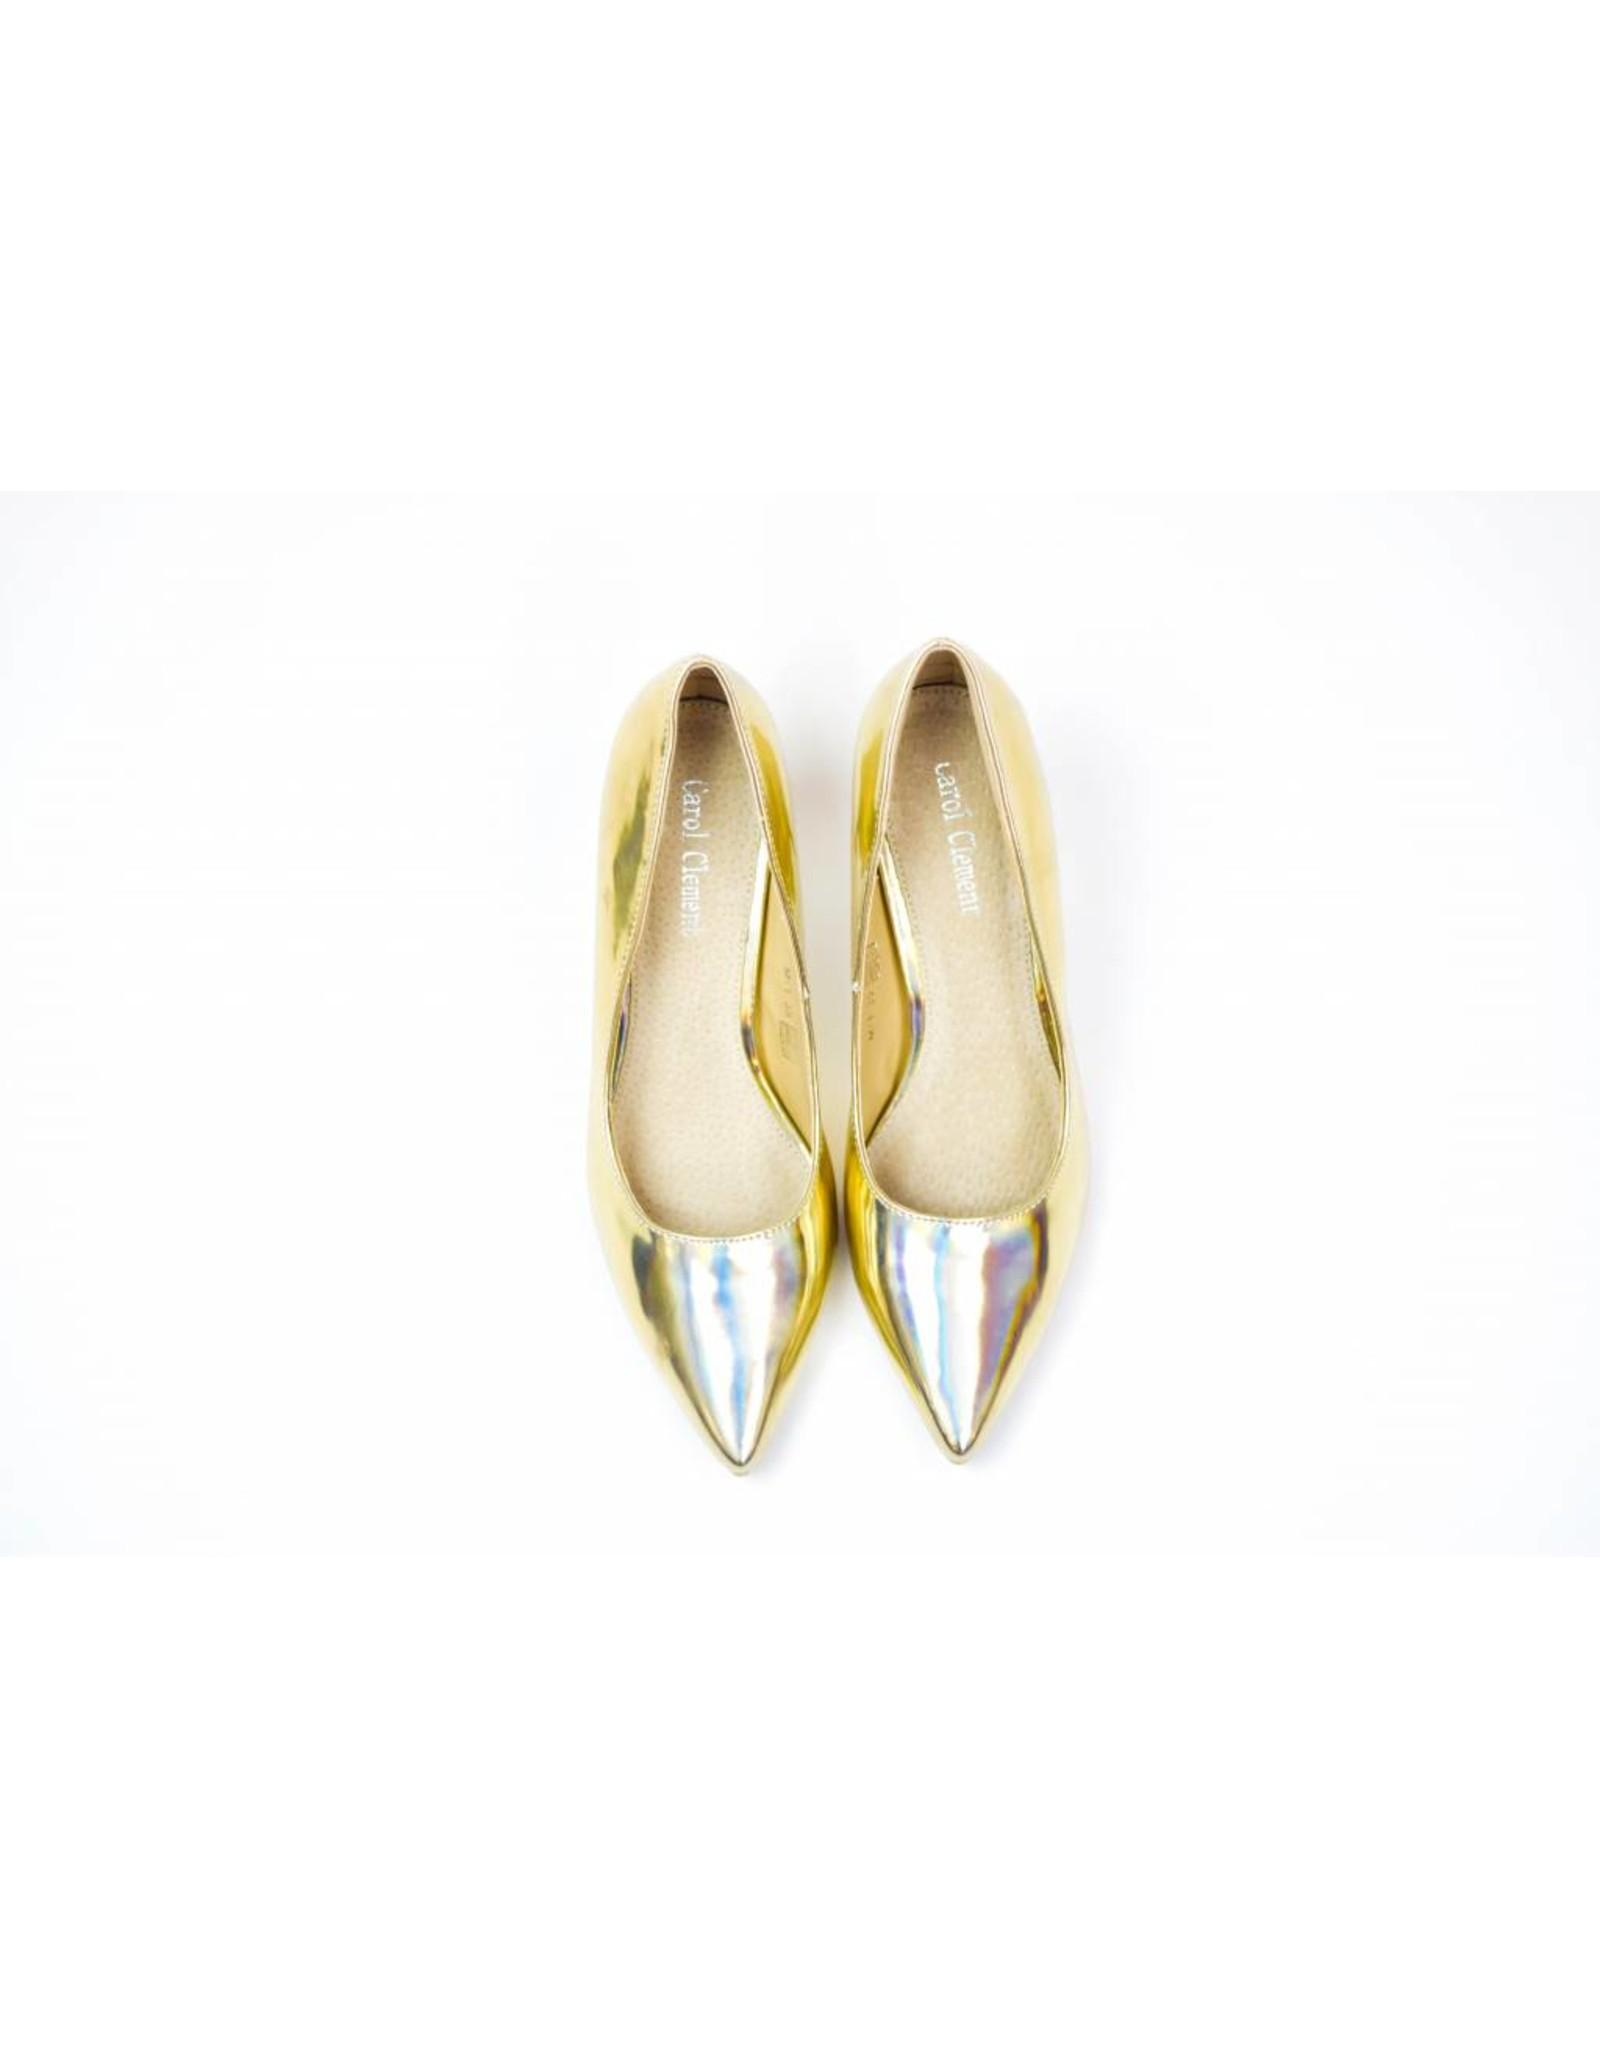 Adeline Gold